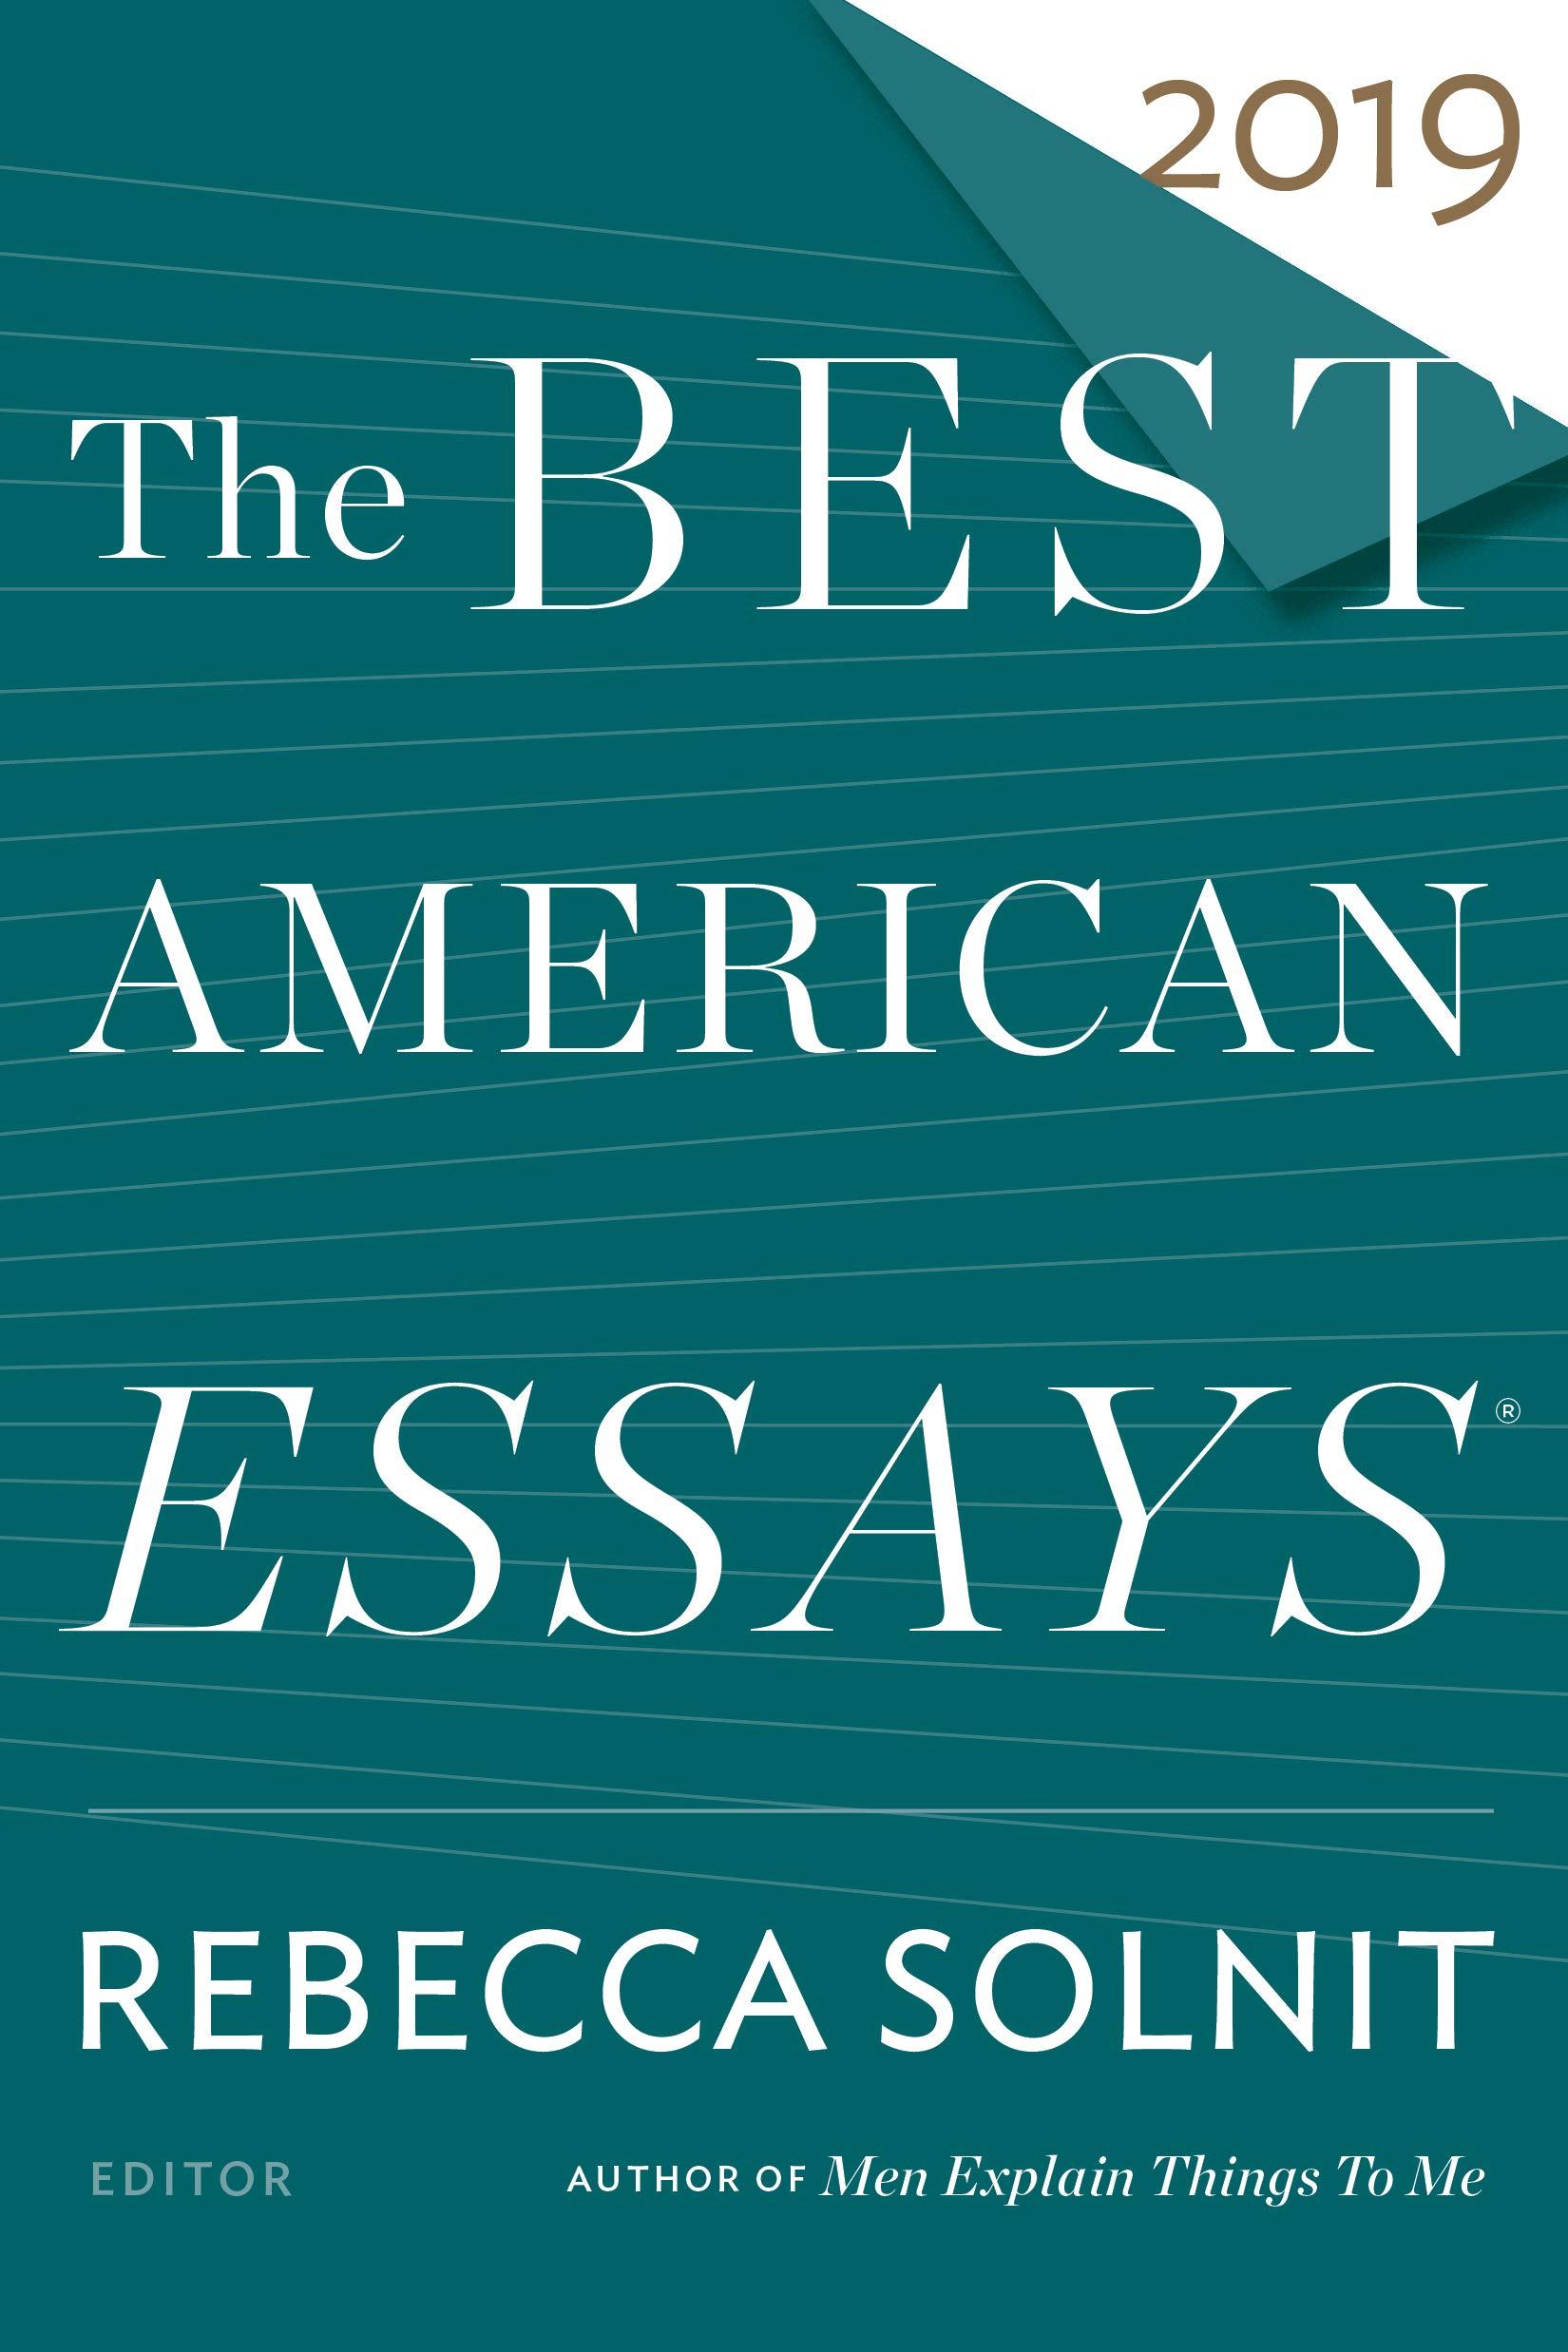 The Best American Essays 2019 The Best American Essays 2019 (The Best American Series